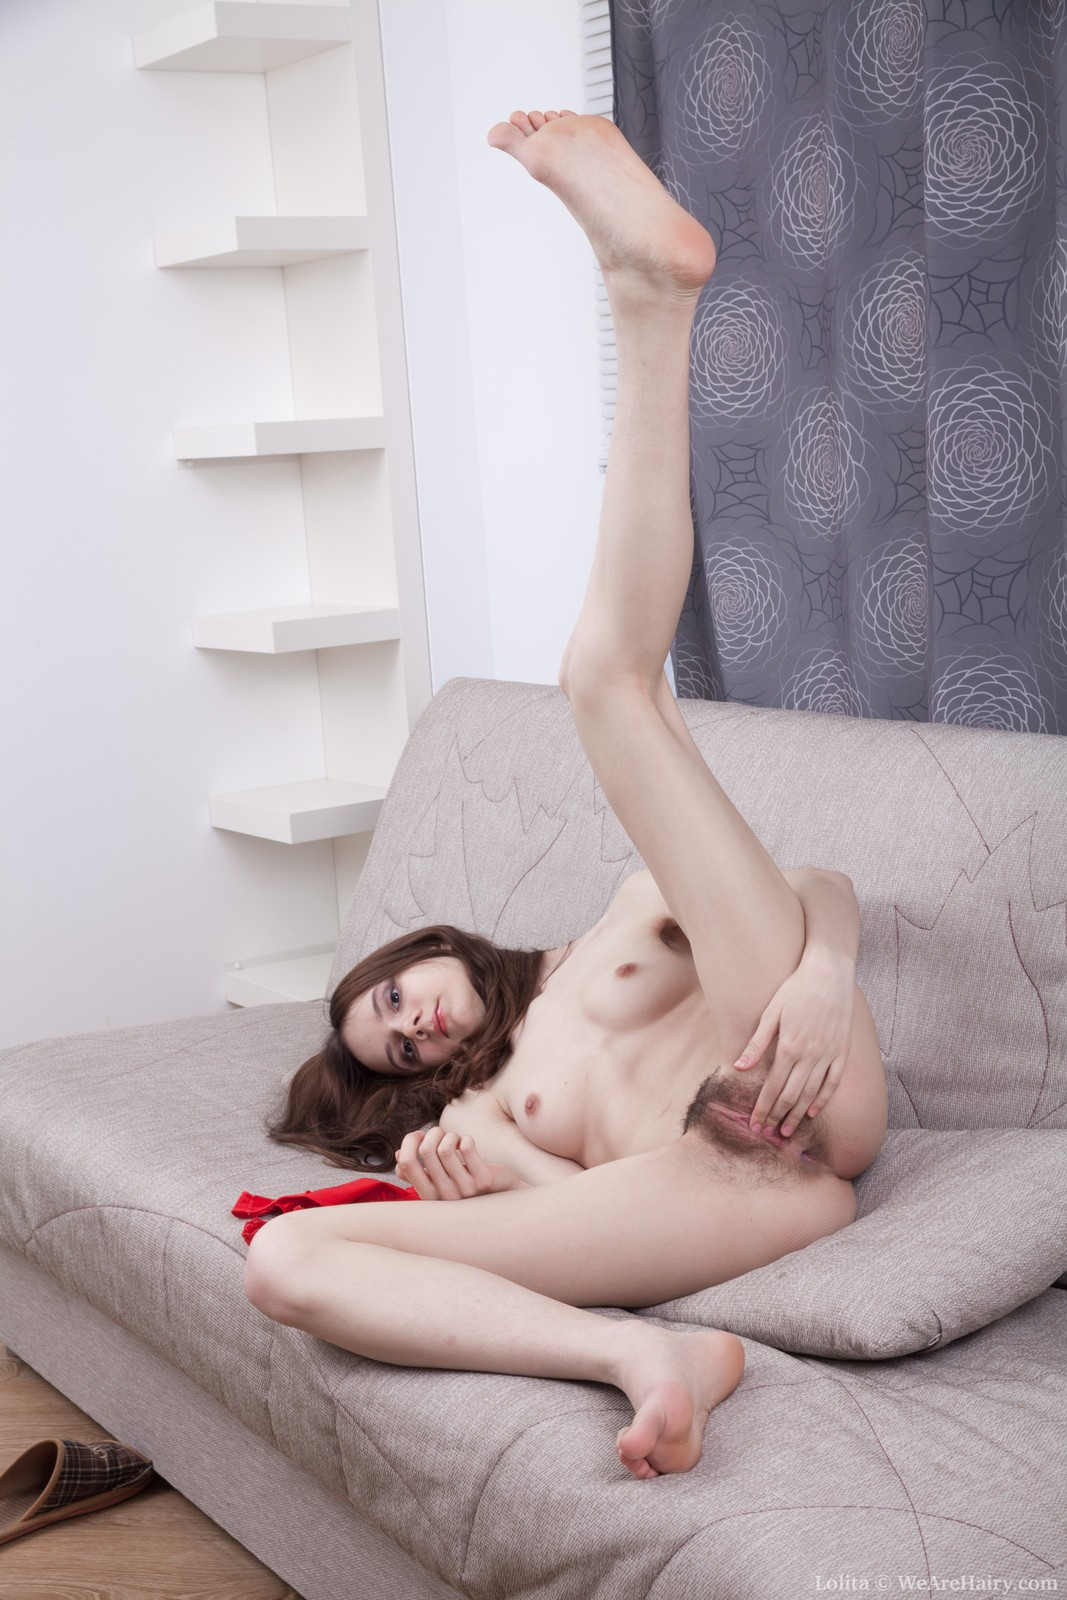 lolita-strips-and-masturbates-after-stargazing14.jpg